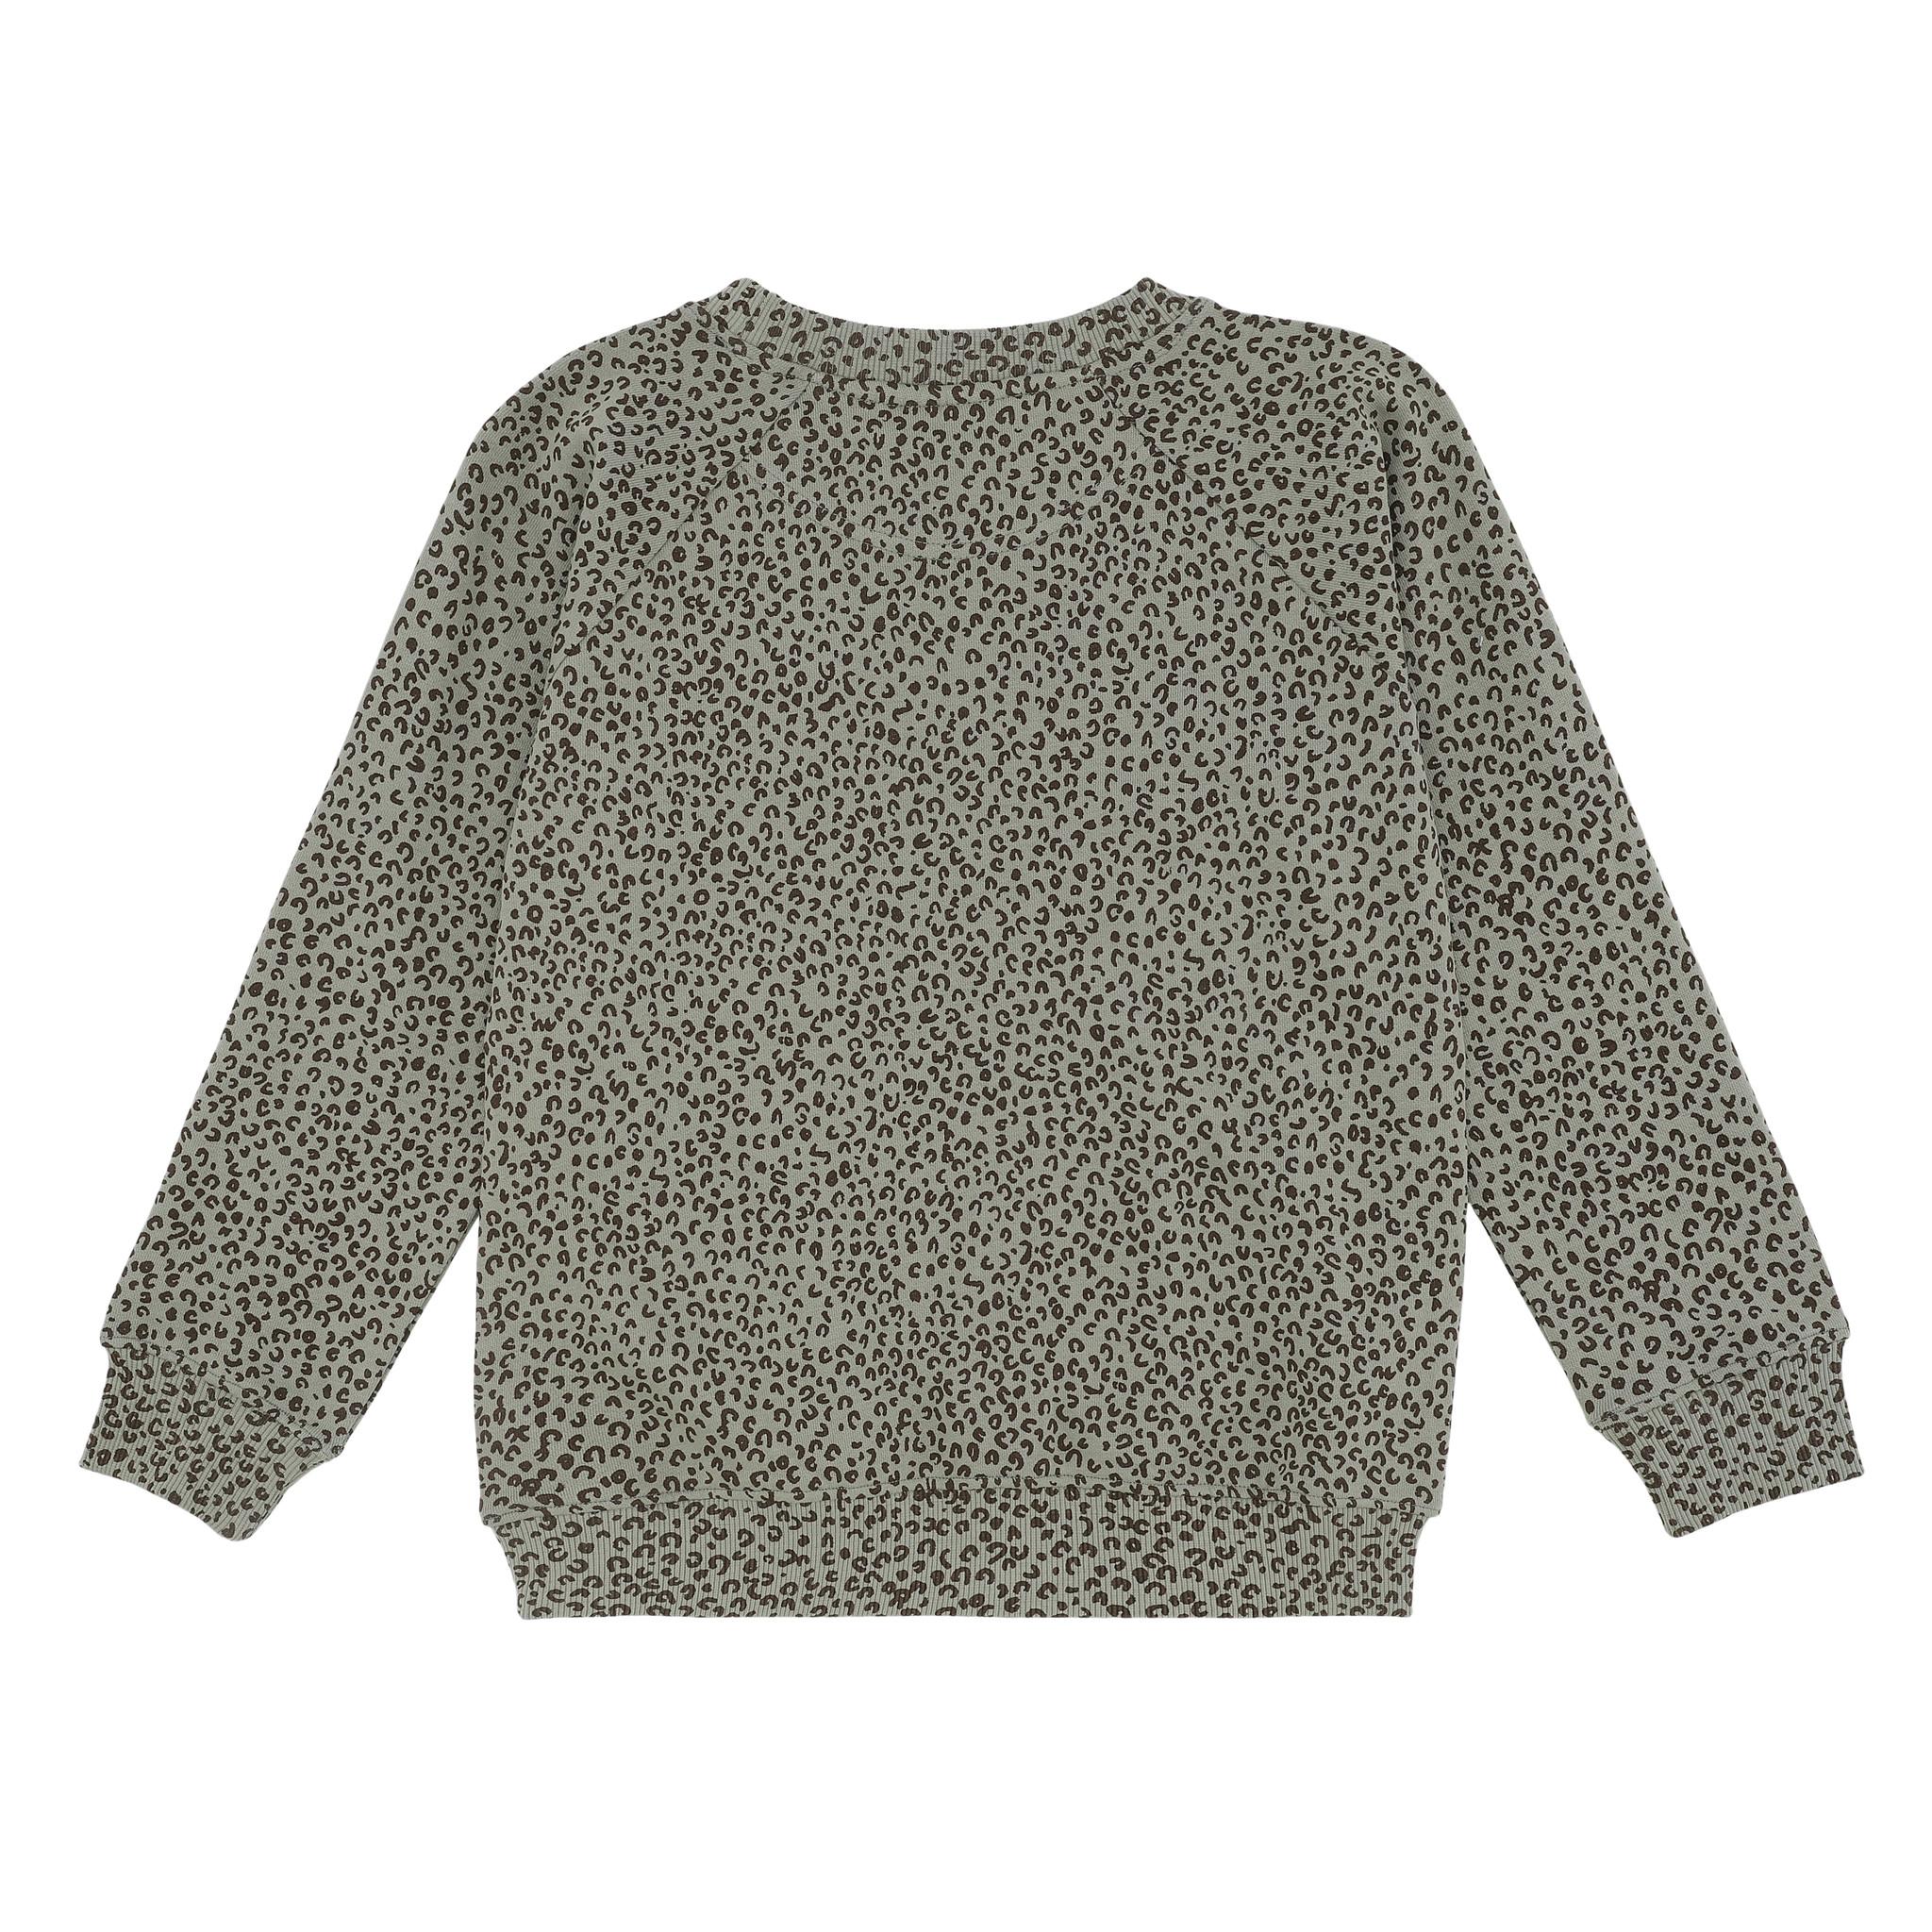 Chaz sweatshirt - Shadow / AOP Leospot-3